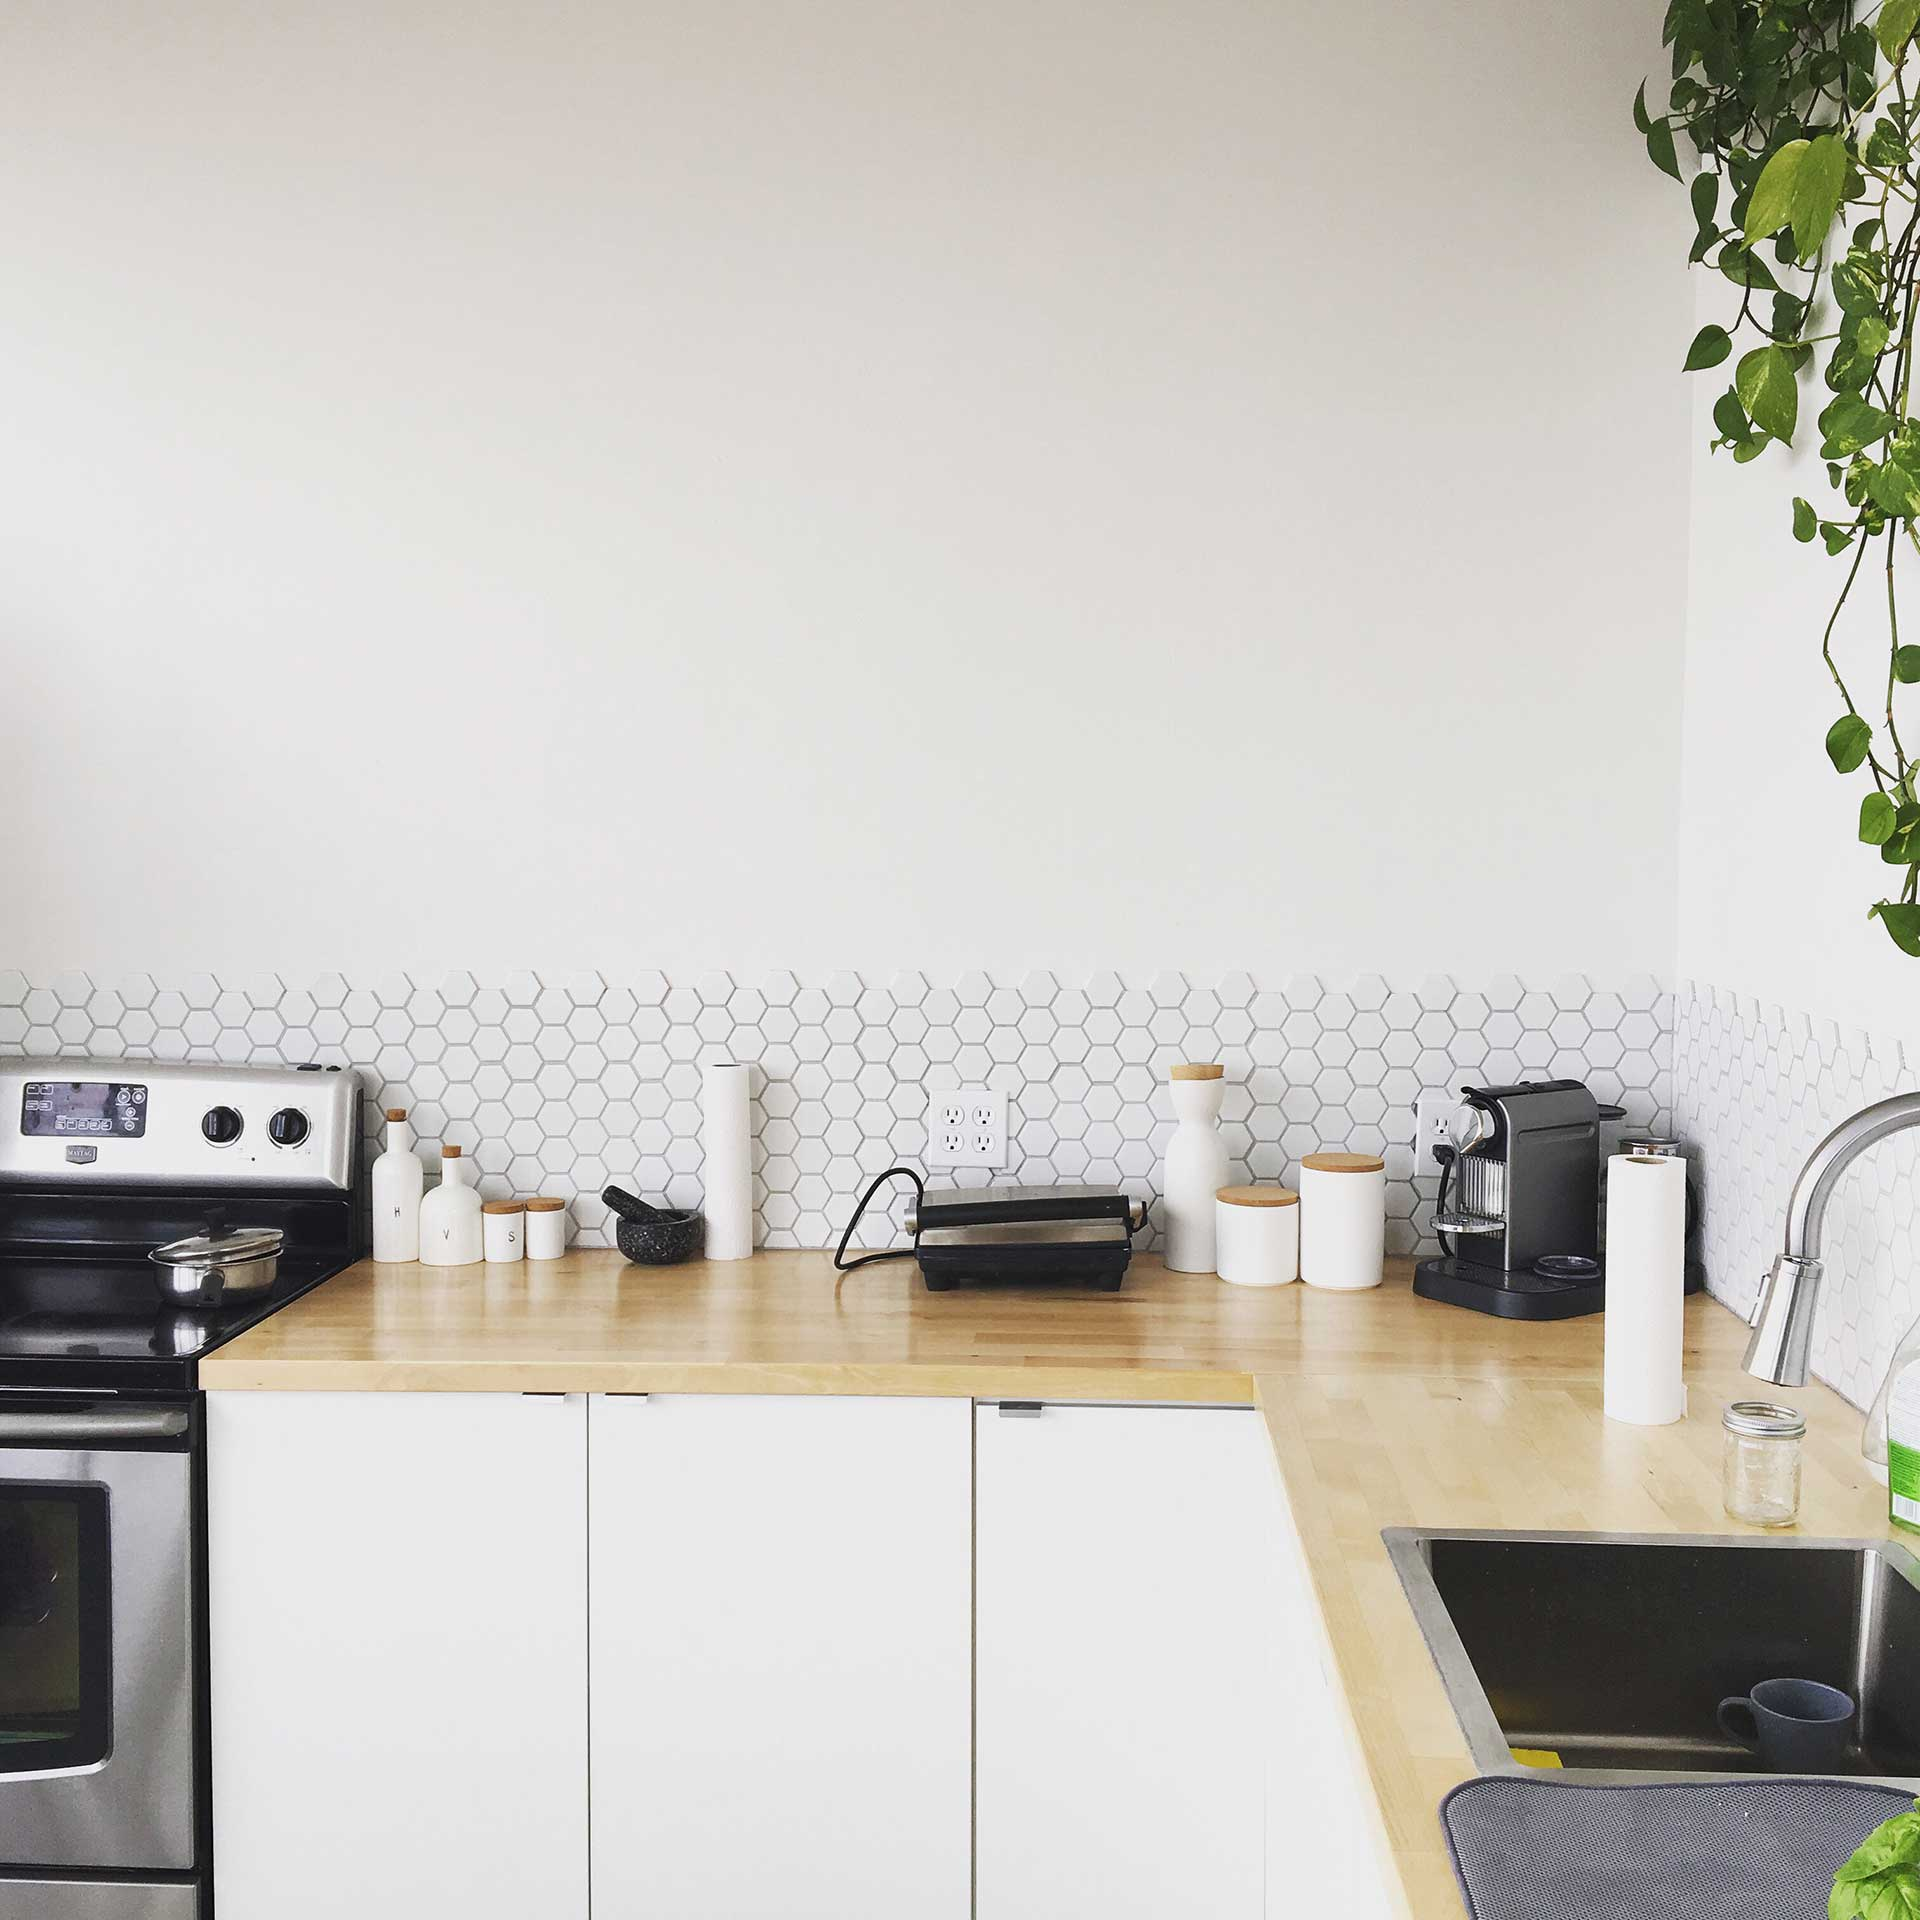 adaptacija kuhinje